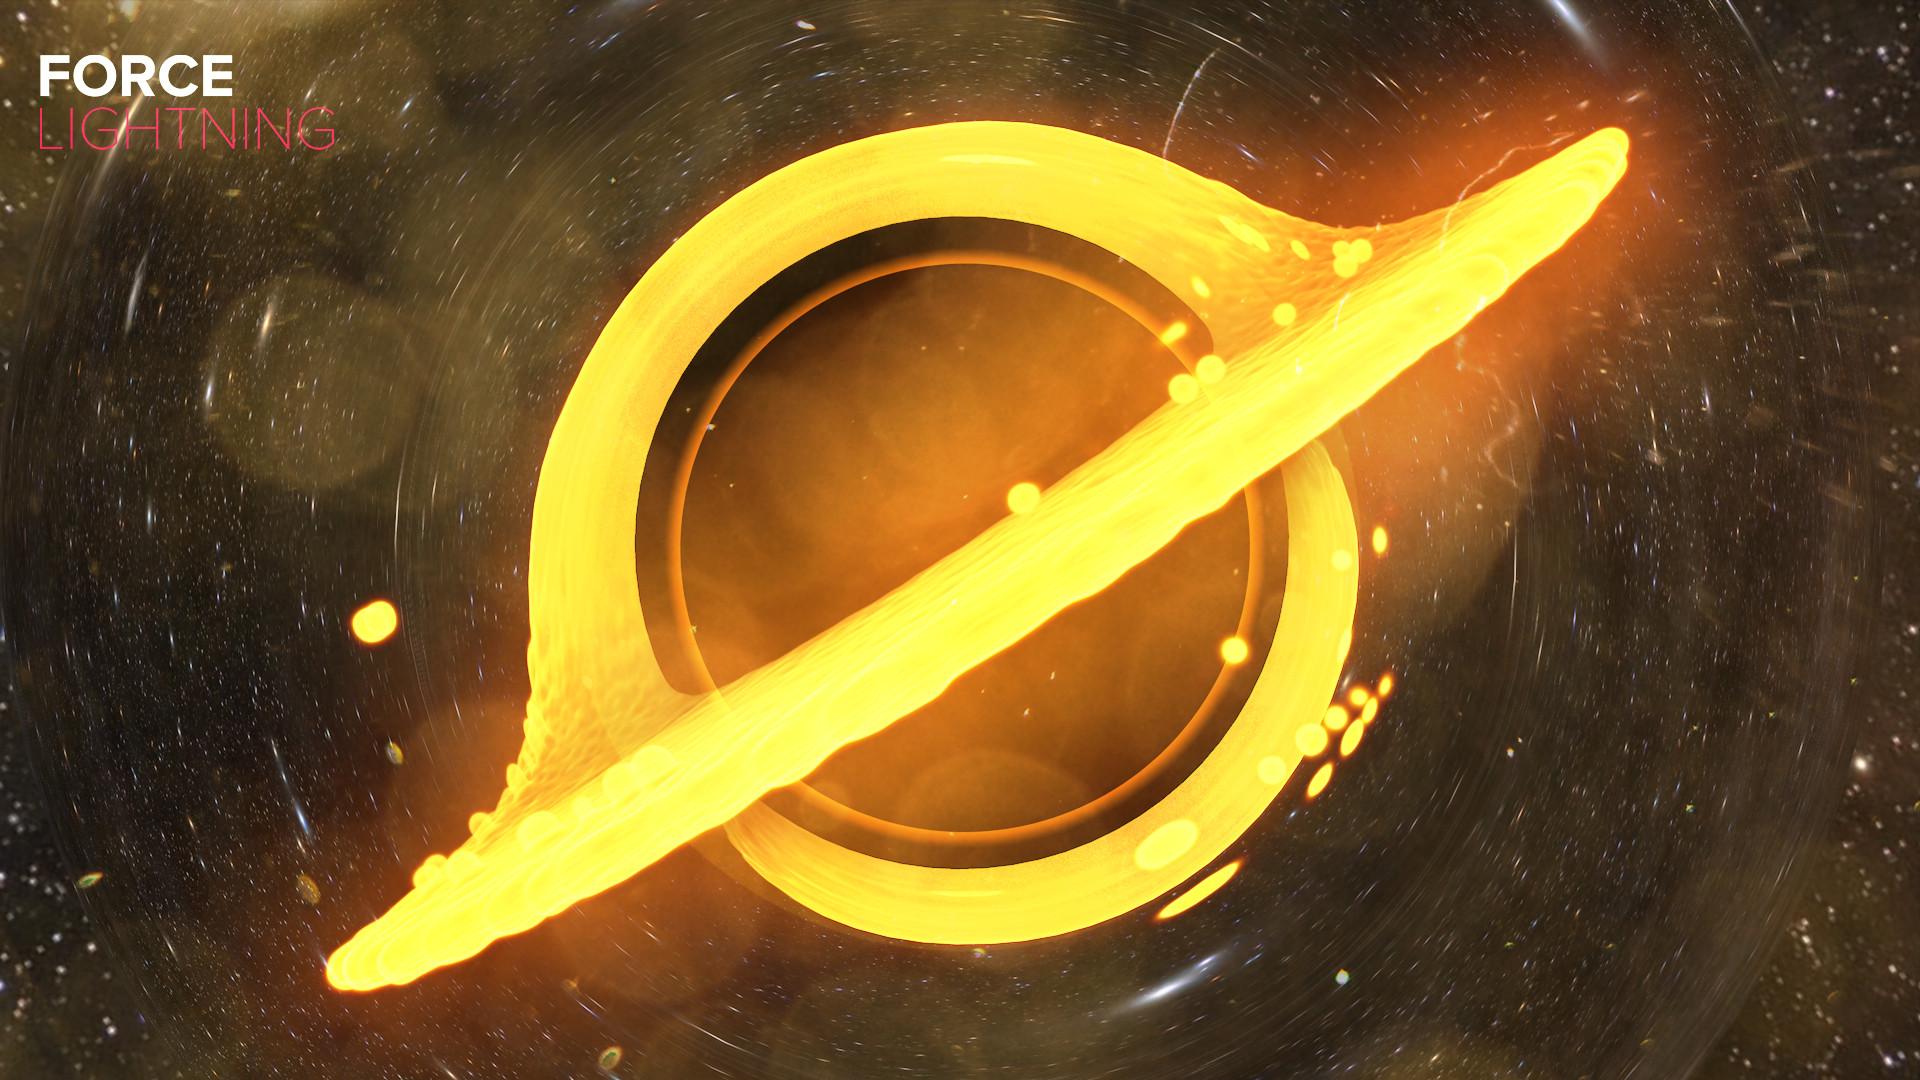 Interstellar Black Hole HD Wallpaper by ForceLightning228 Interstellar  Black Hole HD Wallpaper by ForceLightning228